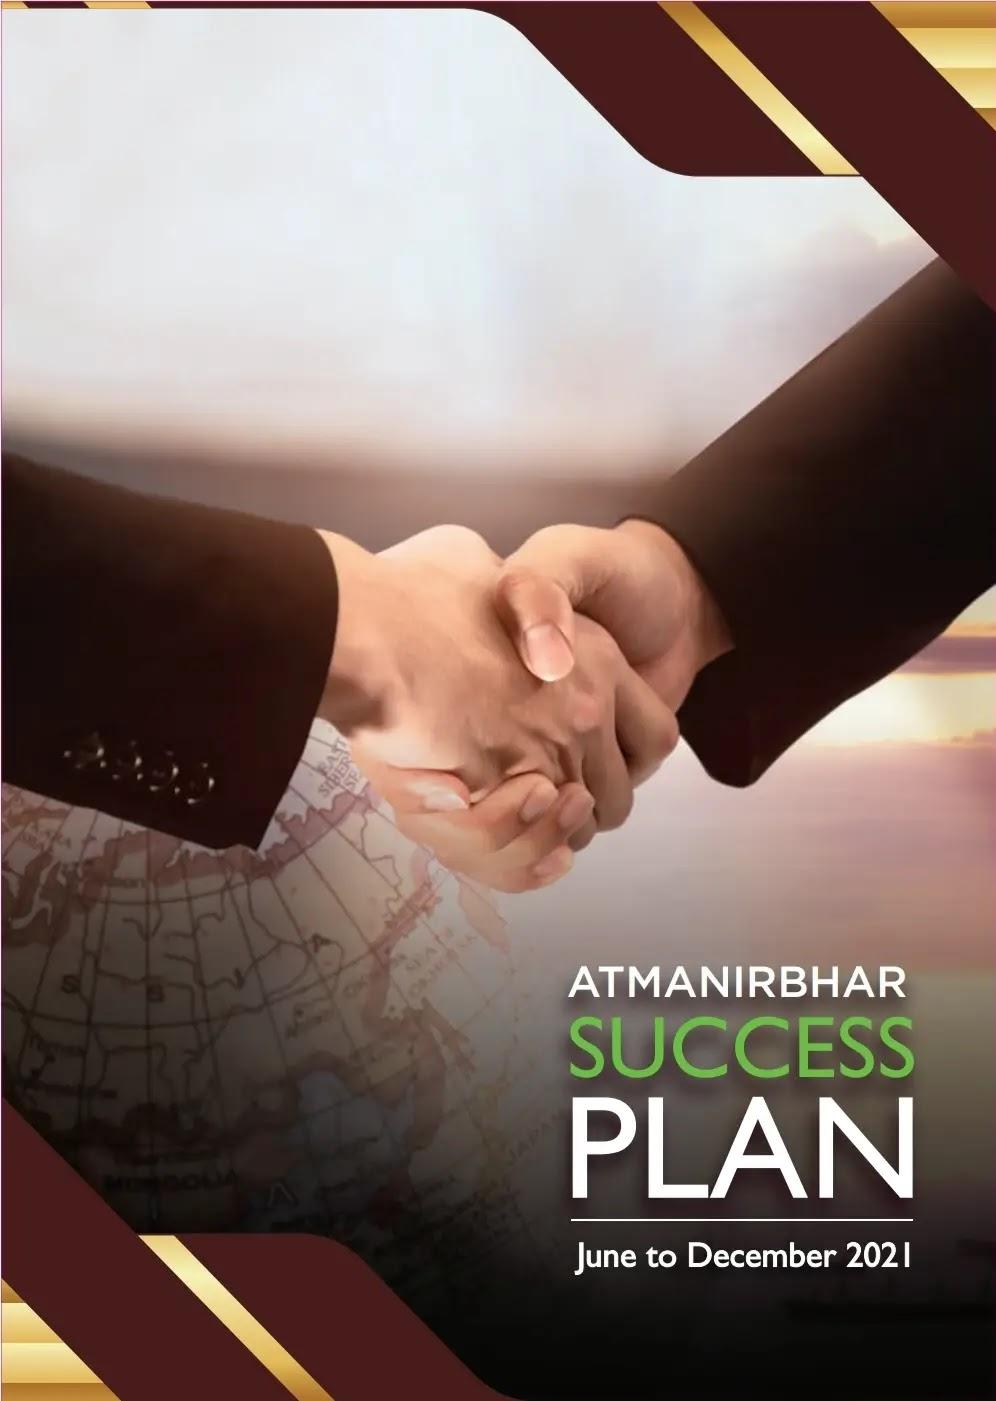 Atmanirbhar Success Plan